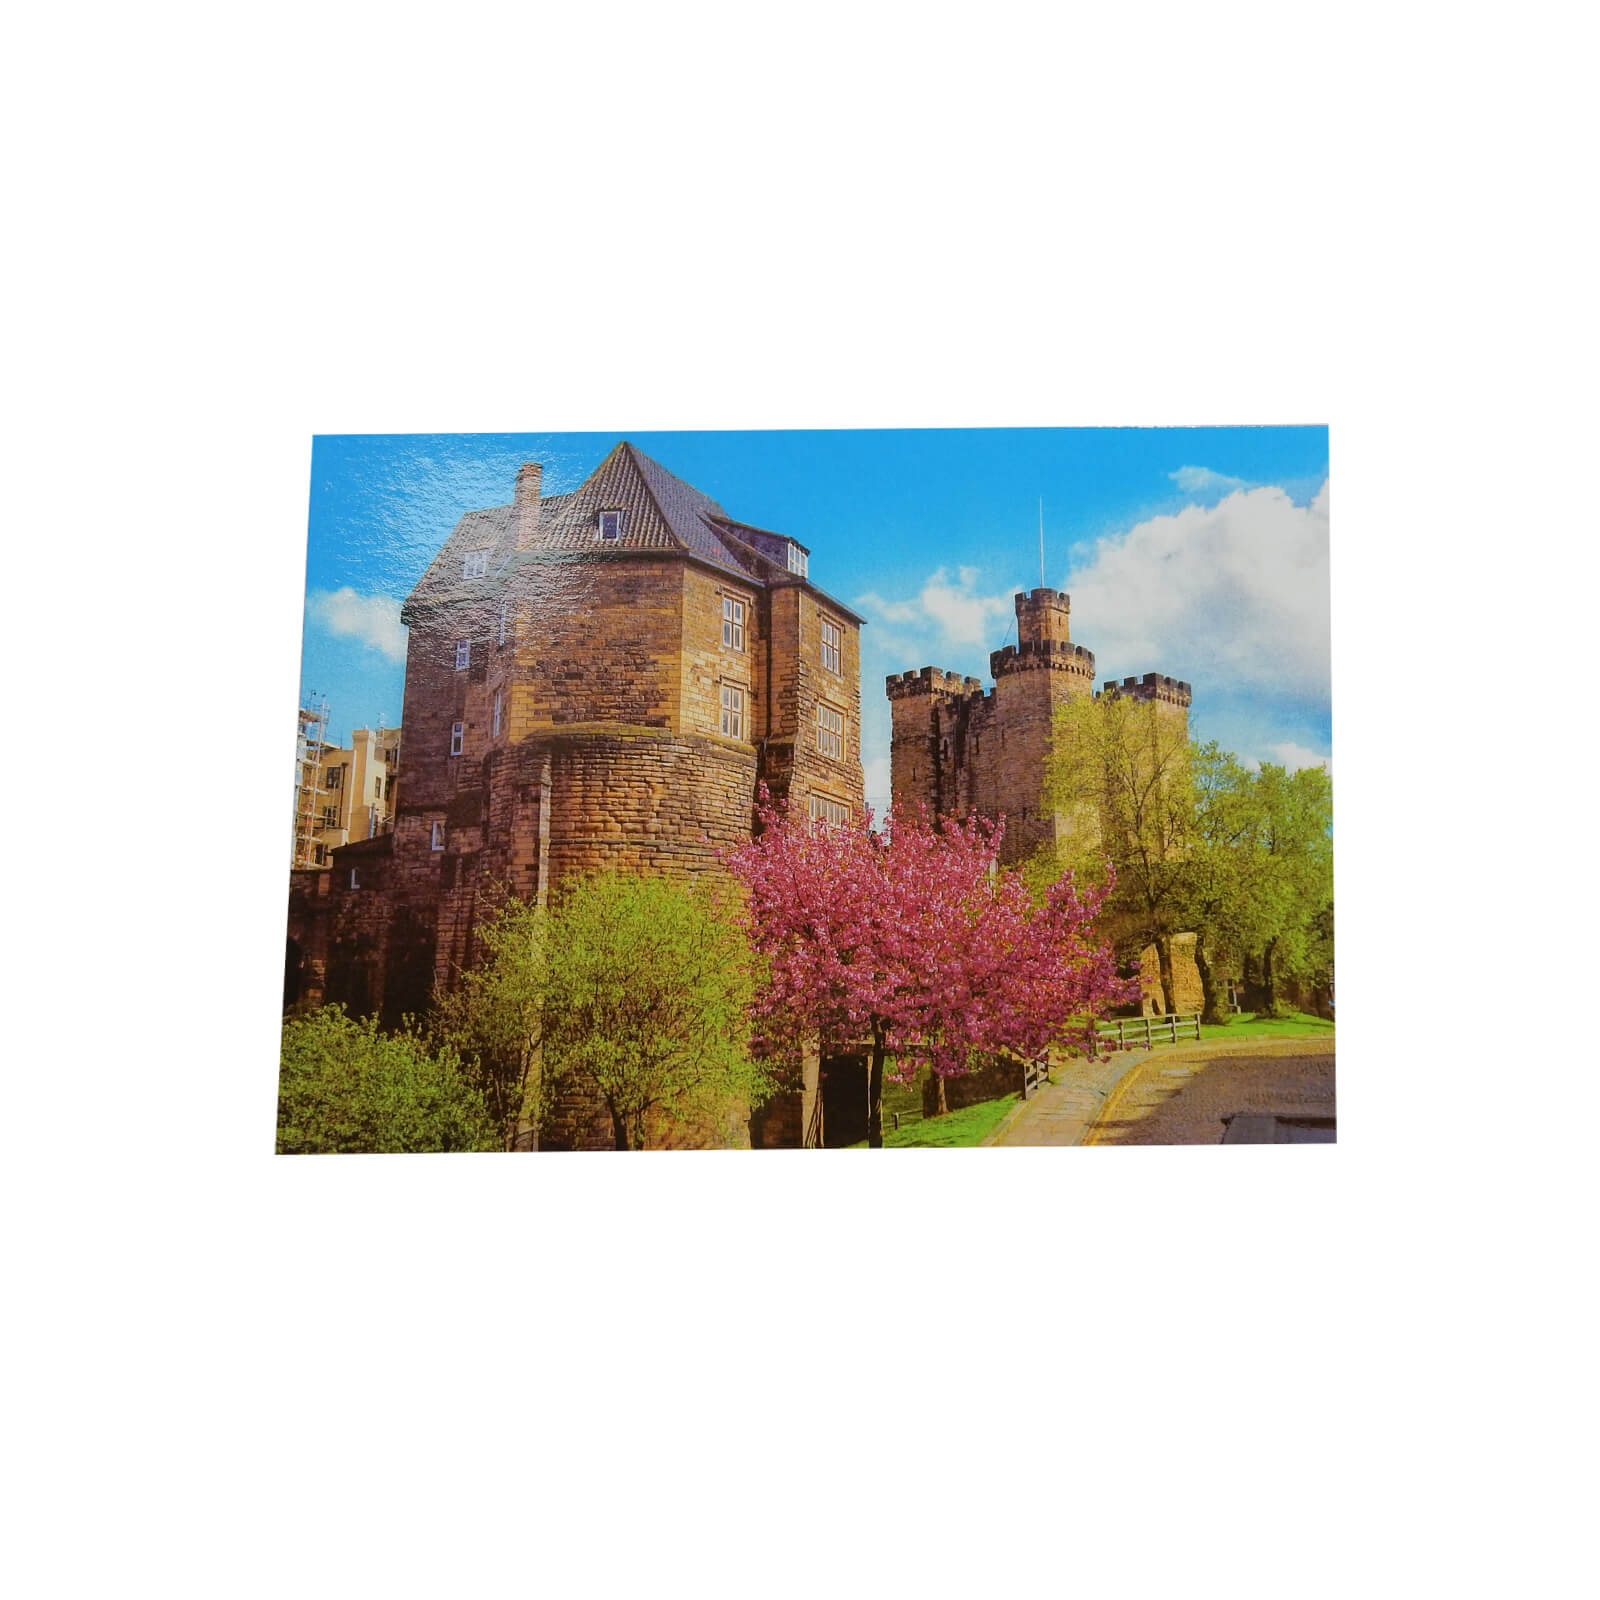 Black Gate & Castle Keep Postcard